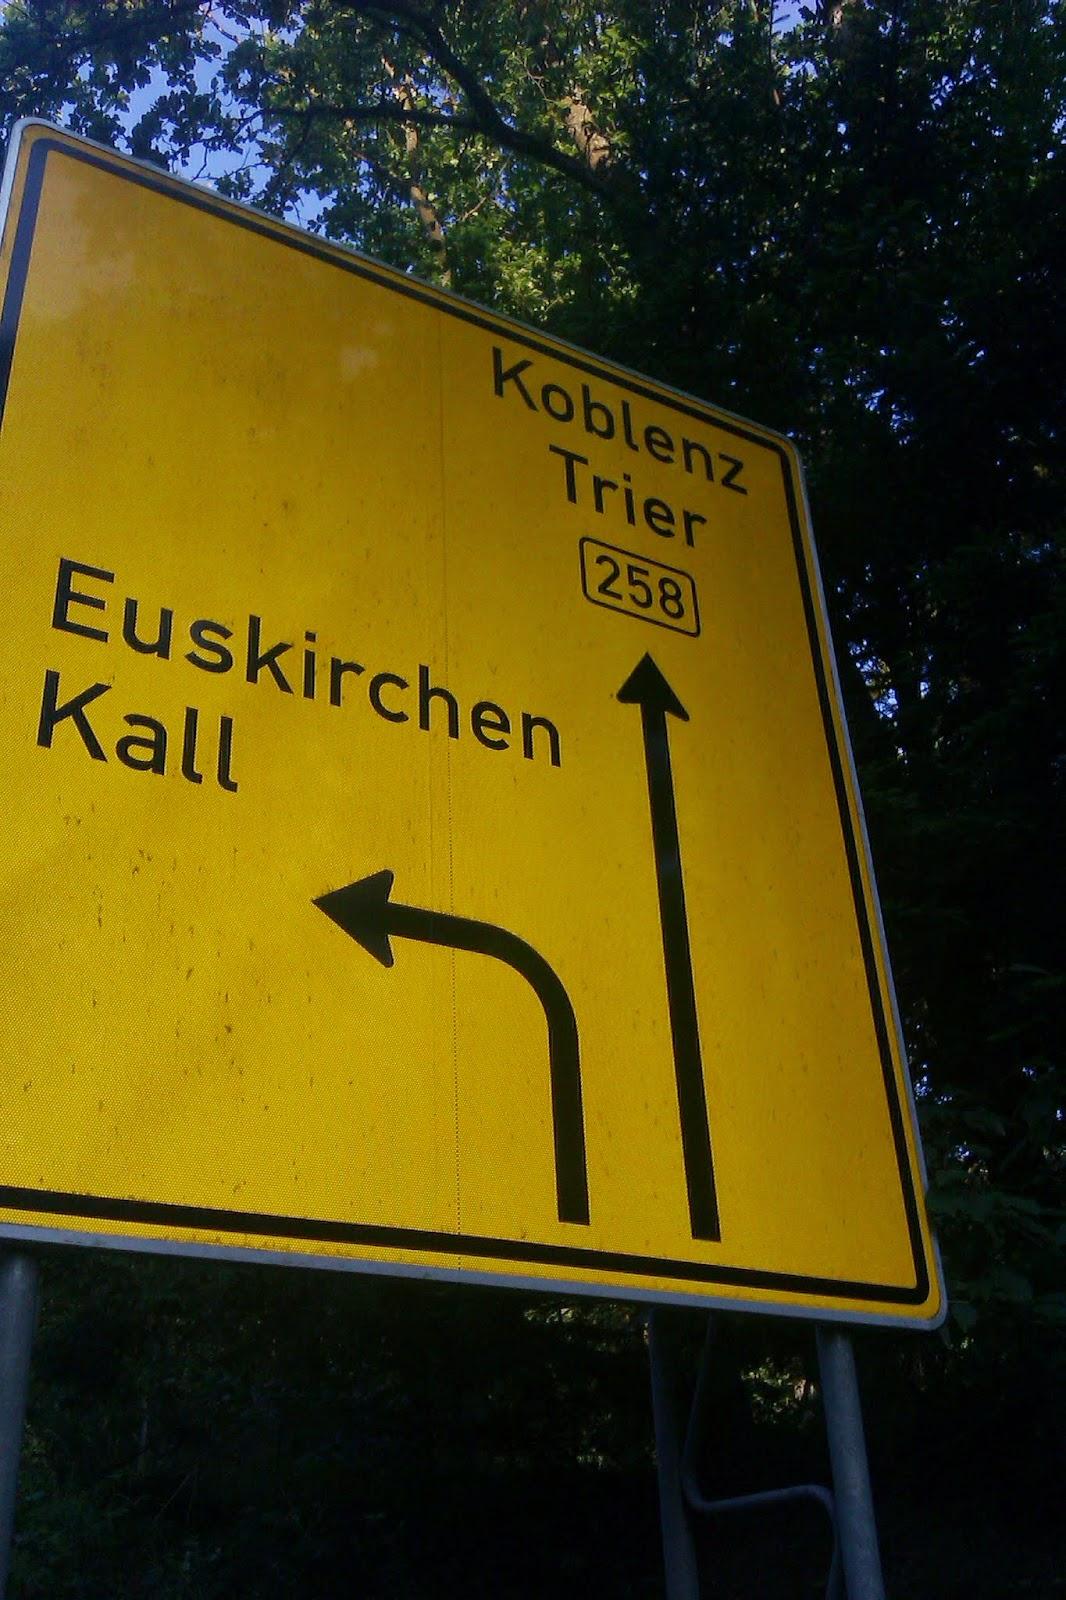 Schleiden Euskirchen Kall